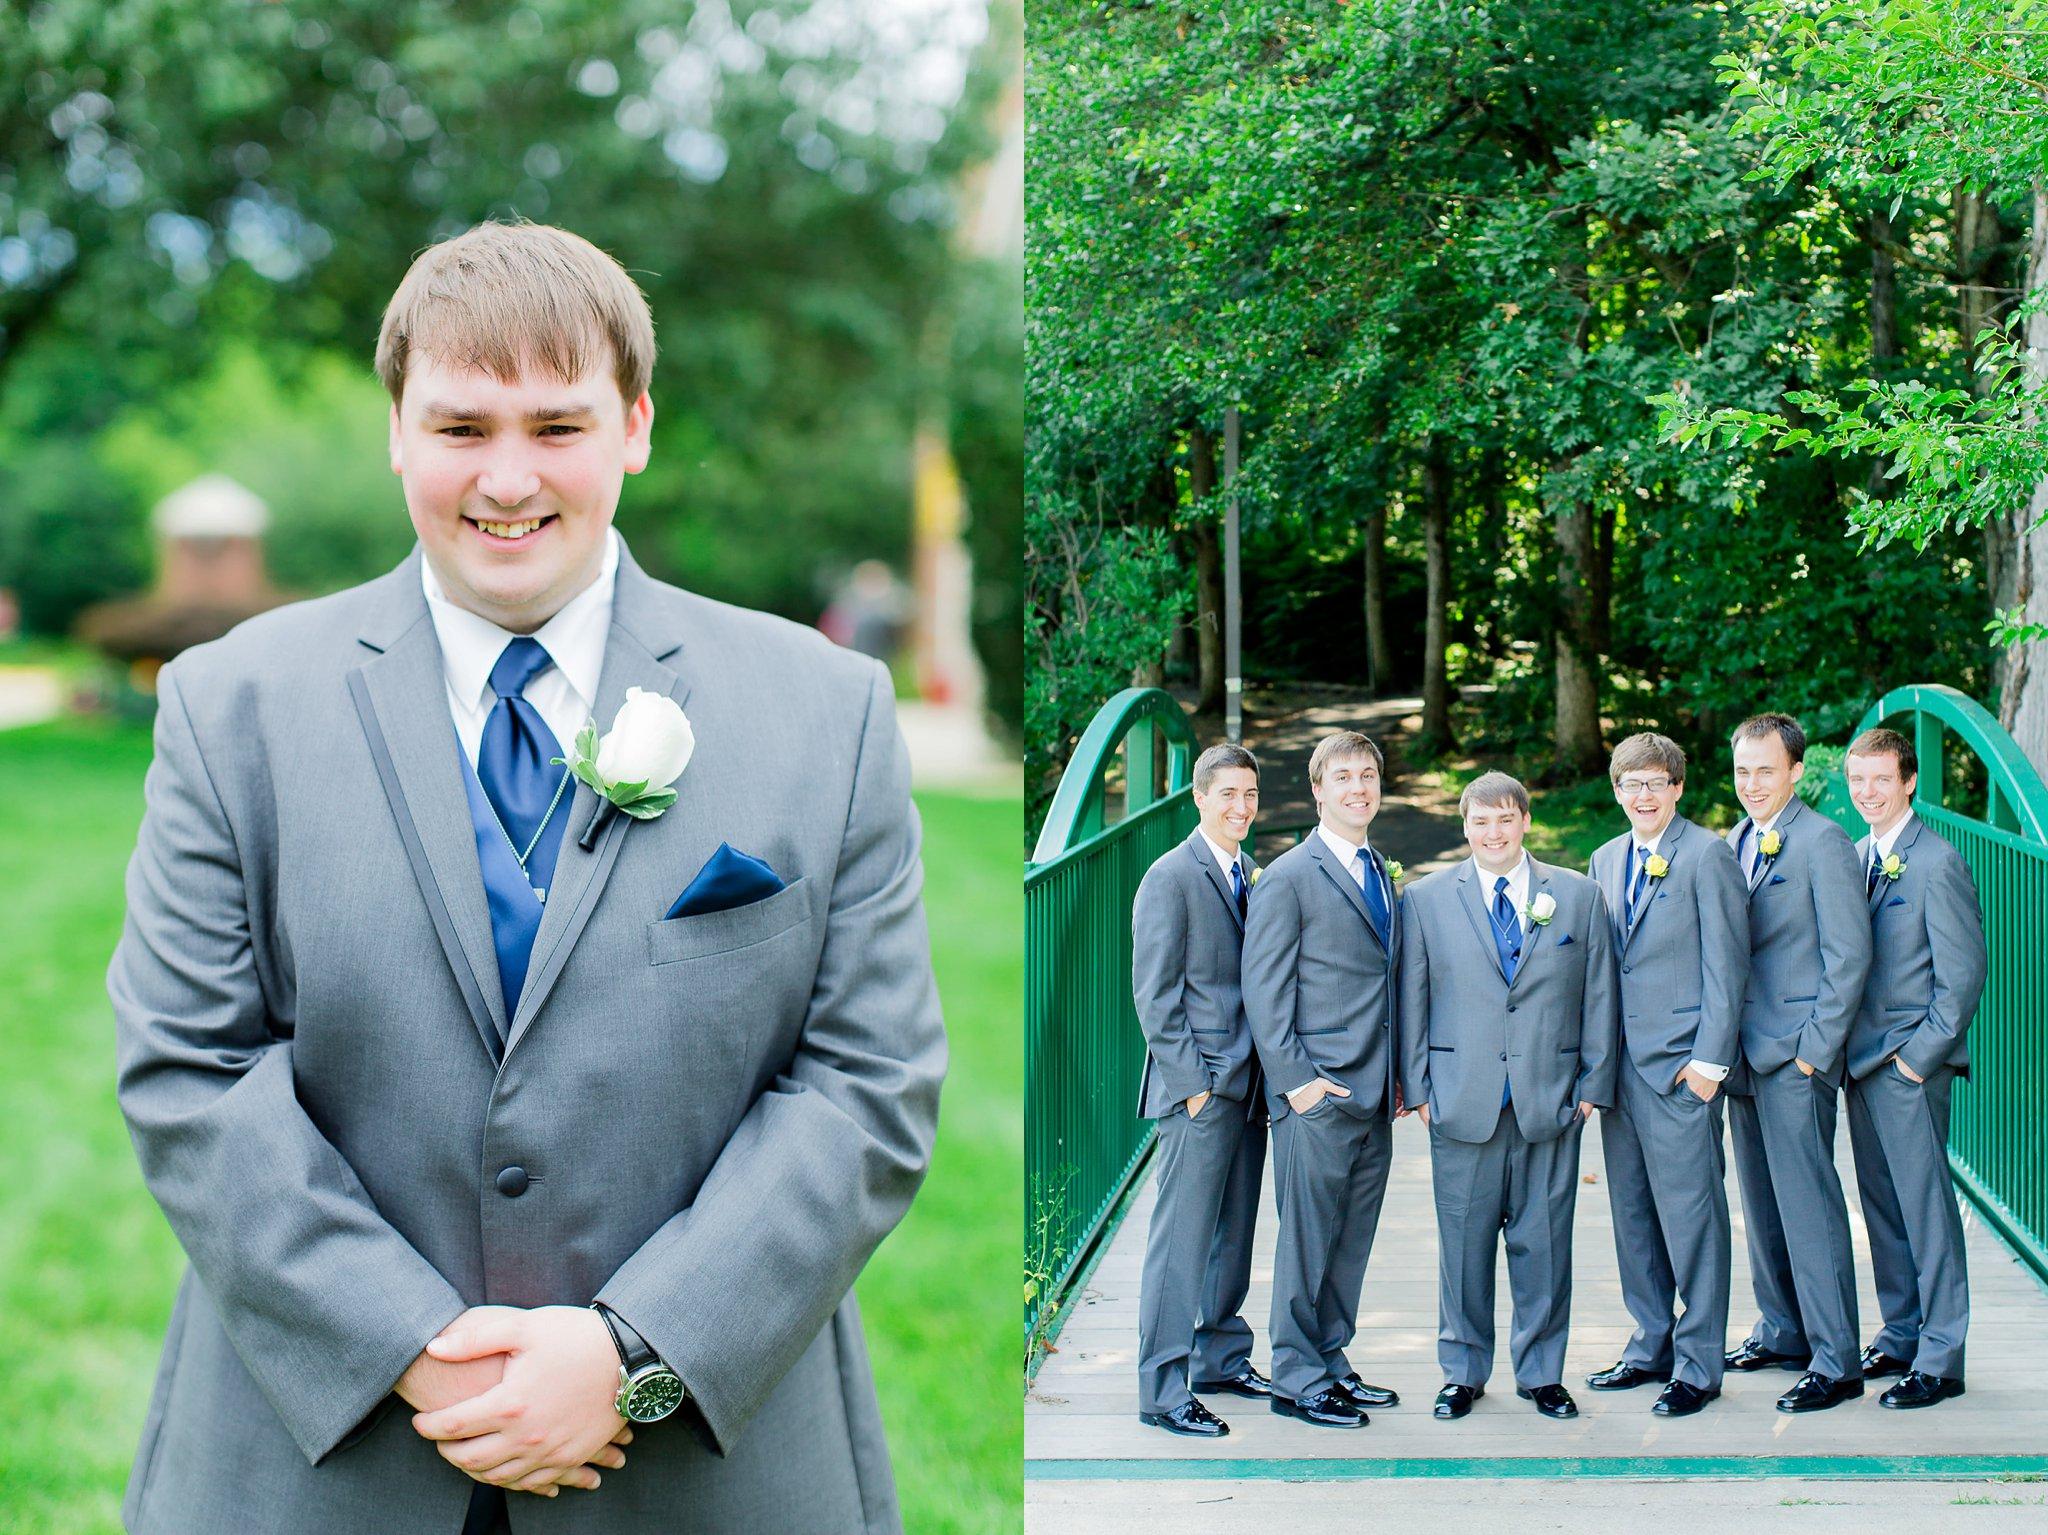 Waterford Fair Oaks Wedding Photos Northern Virginia Wedding Photographer Megan Kelsey Photography Lindsay & Joey-44.jpg